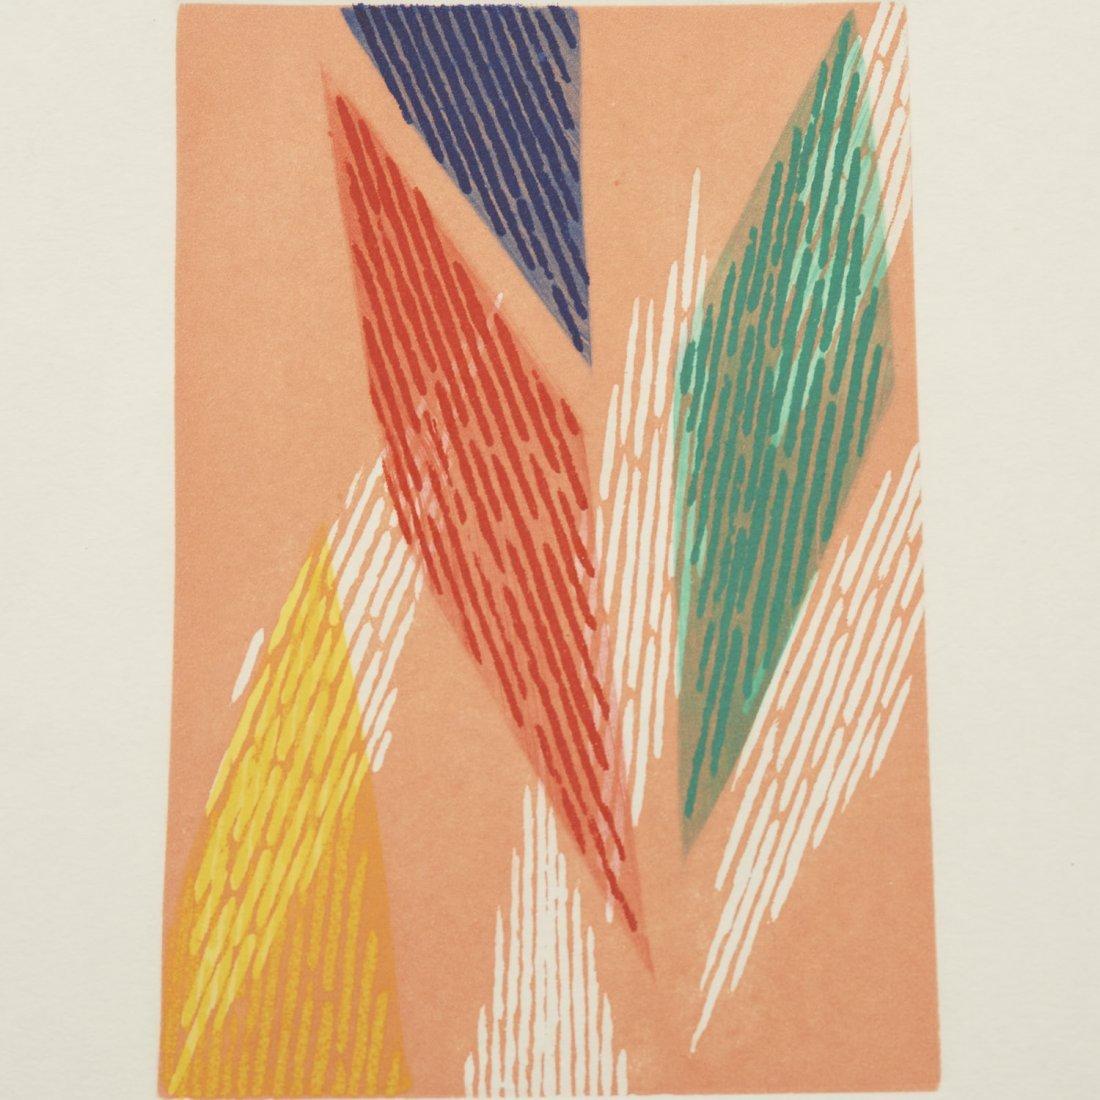 (4) Abstract paintings on paper inc. Piero Dorazio - 5